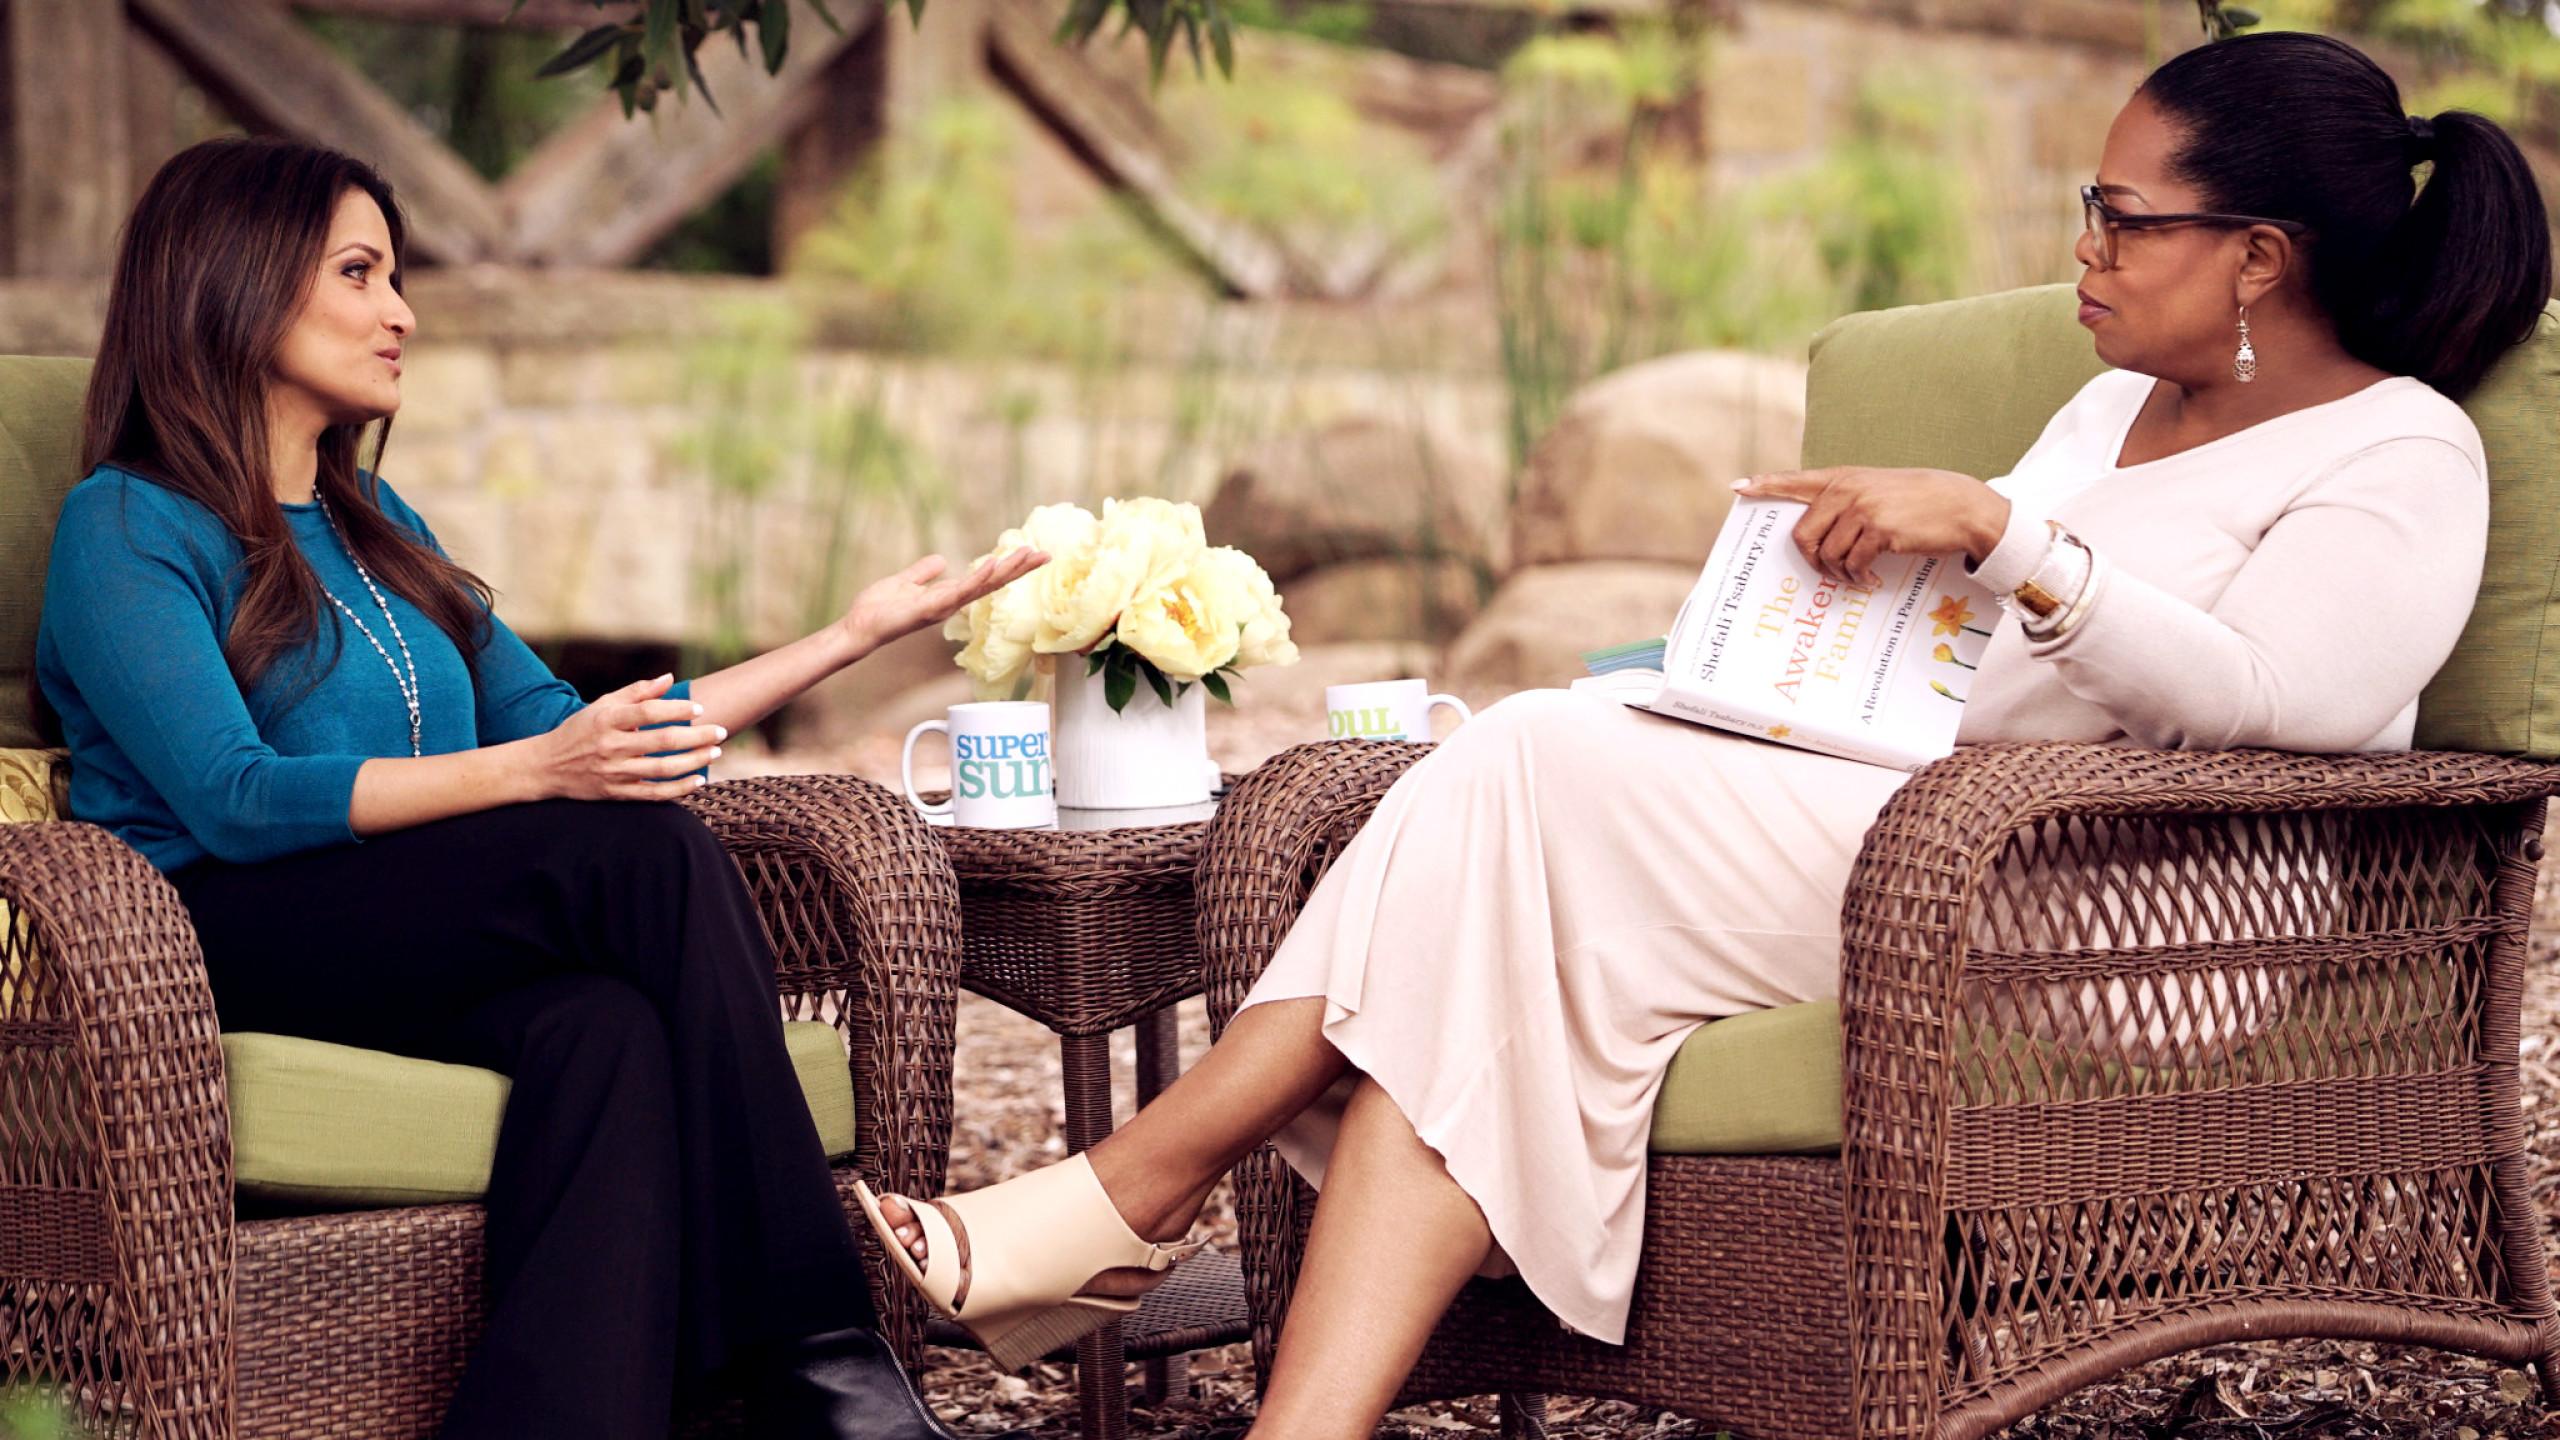 Shefali and Oprah